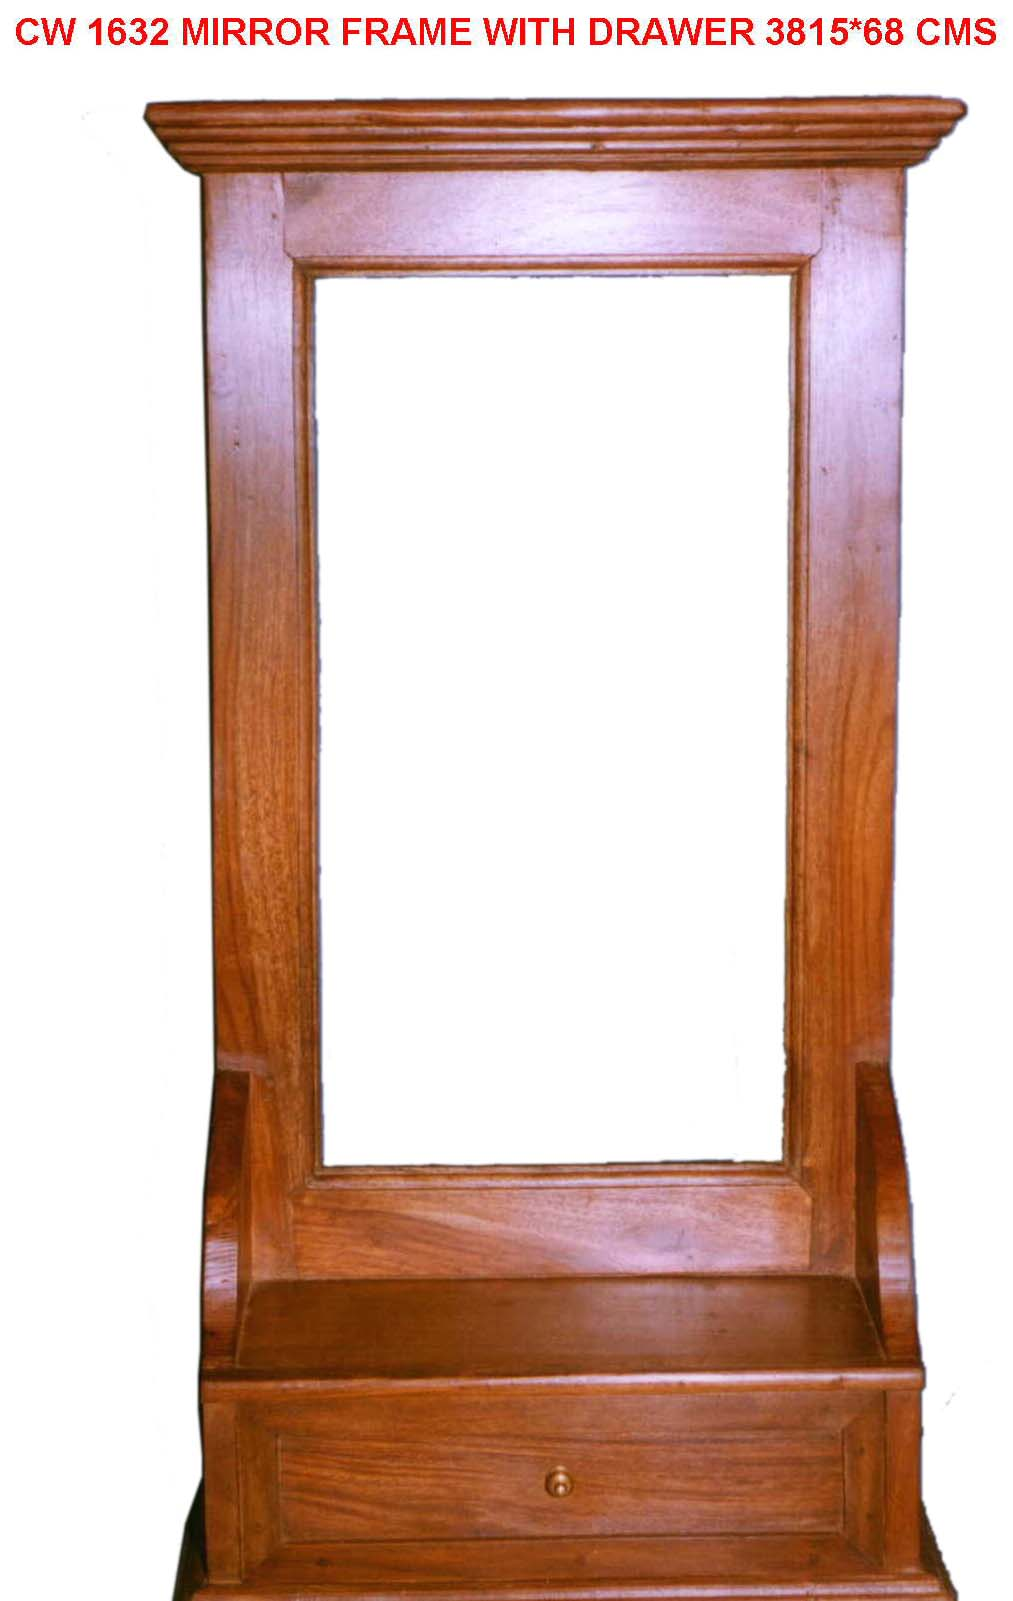 Marco de espejo madera con caj n artesan a madera for Modelos de espejos con marcos de madera